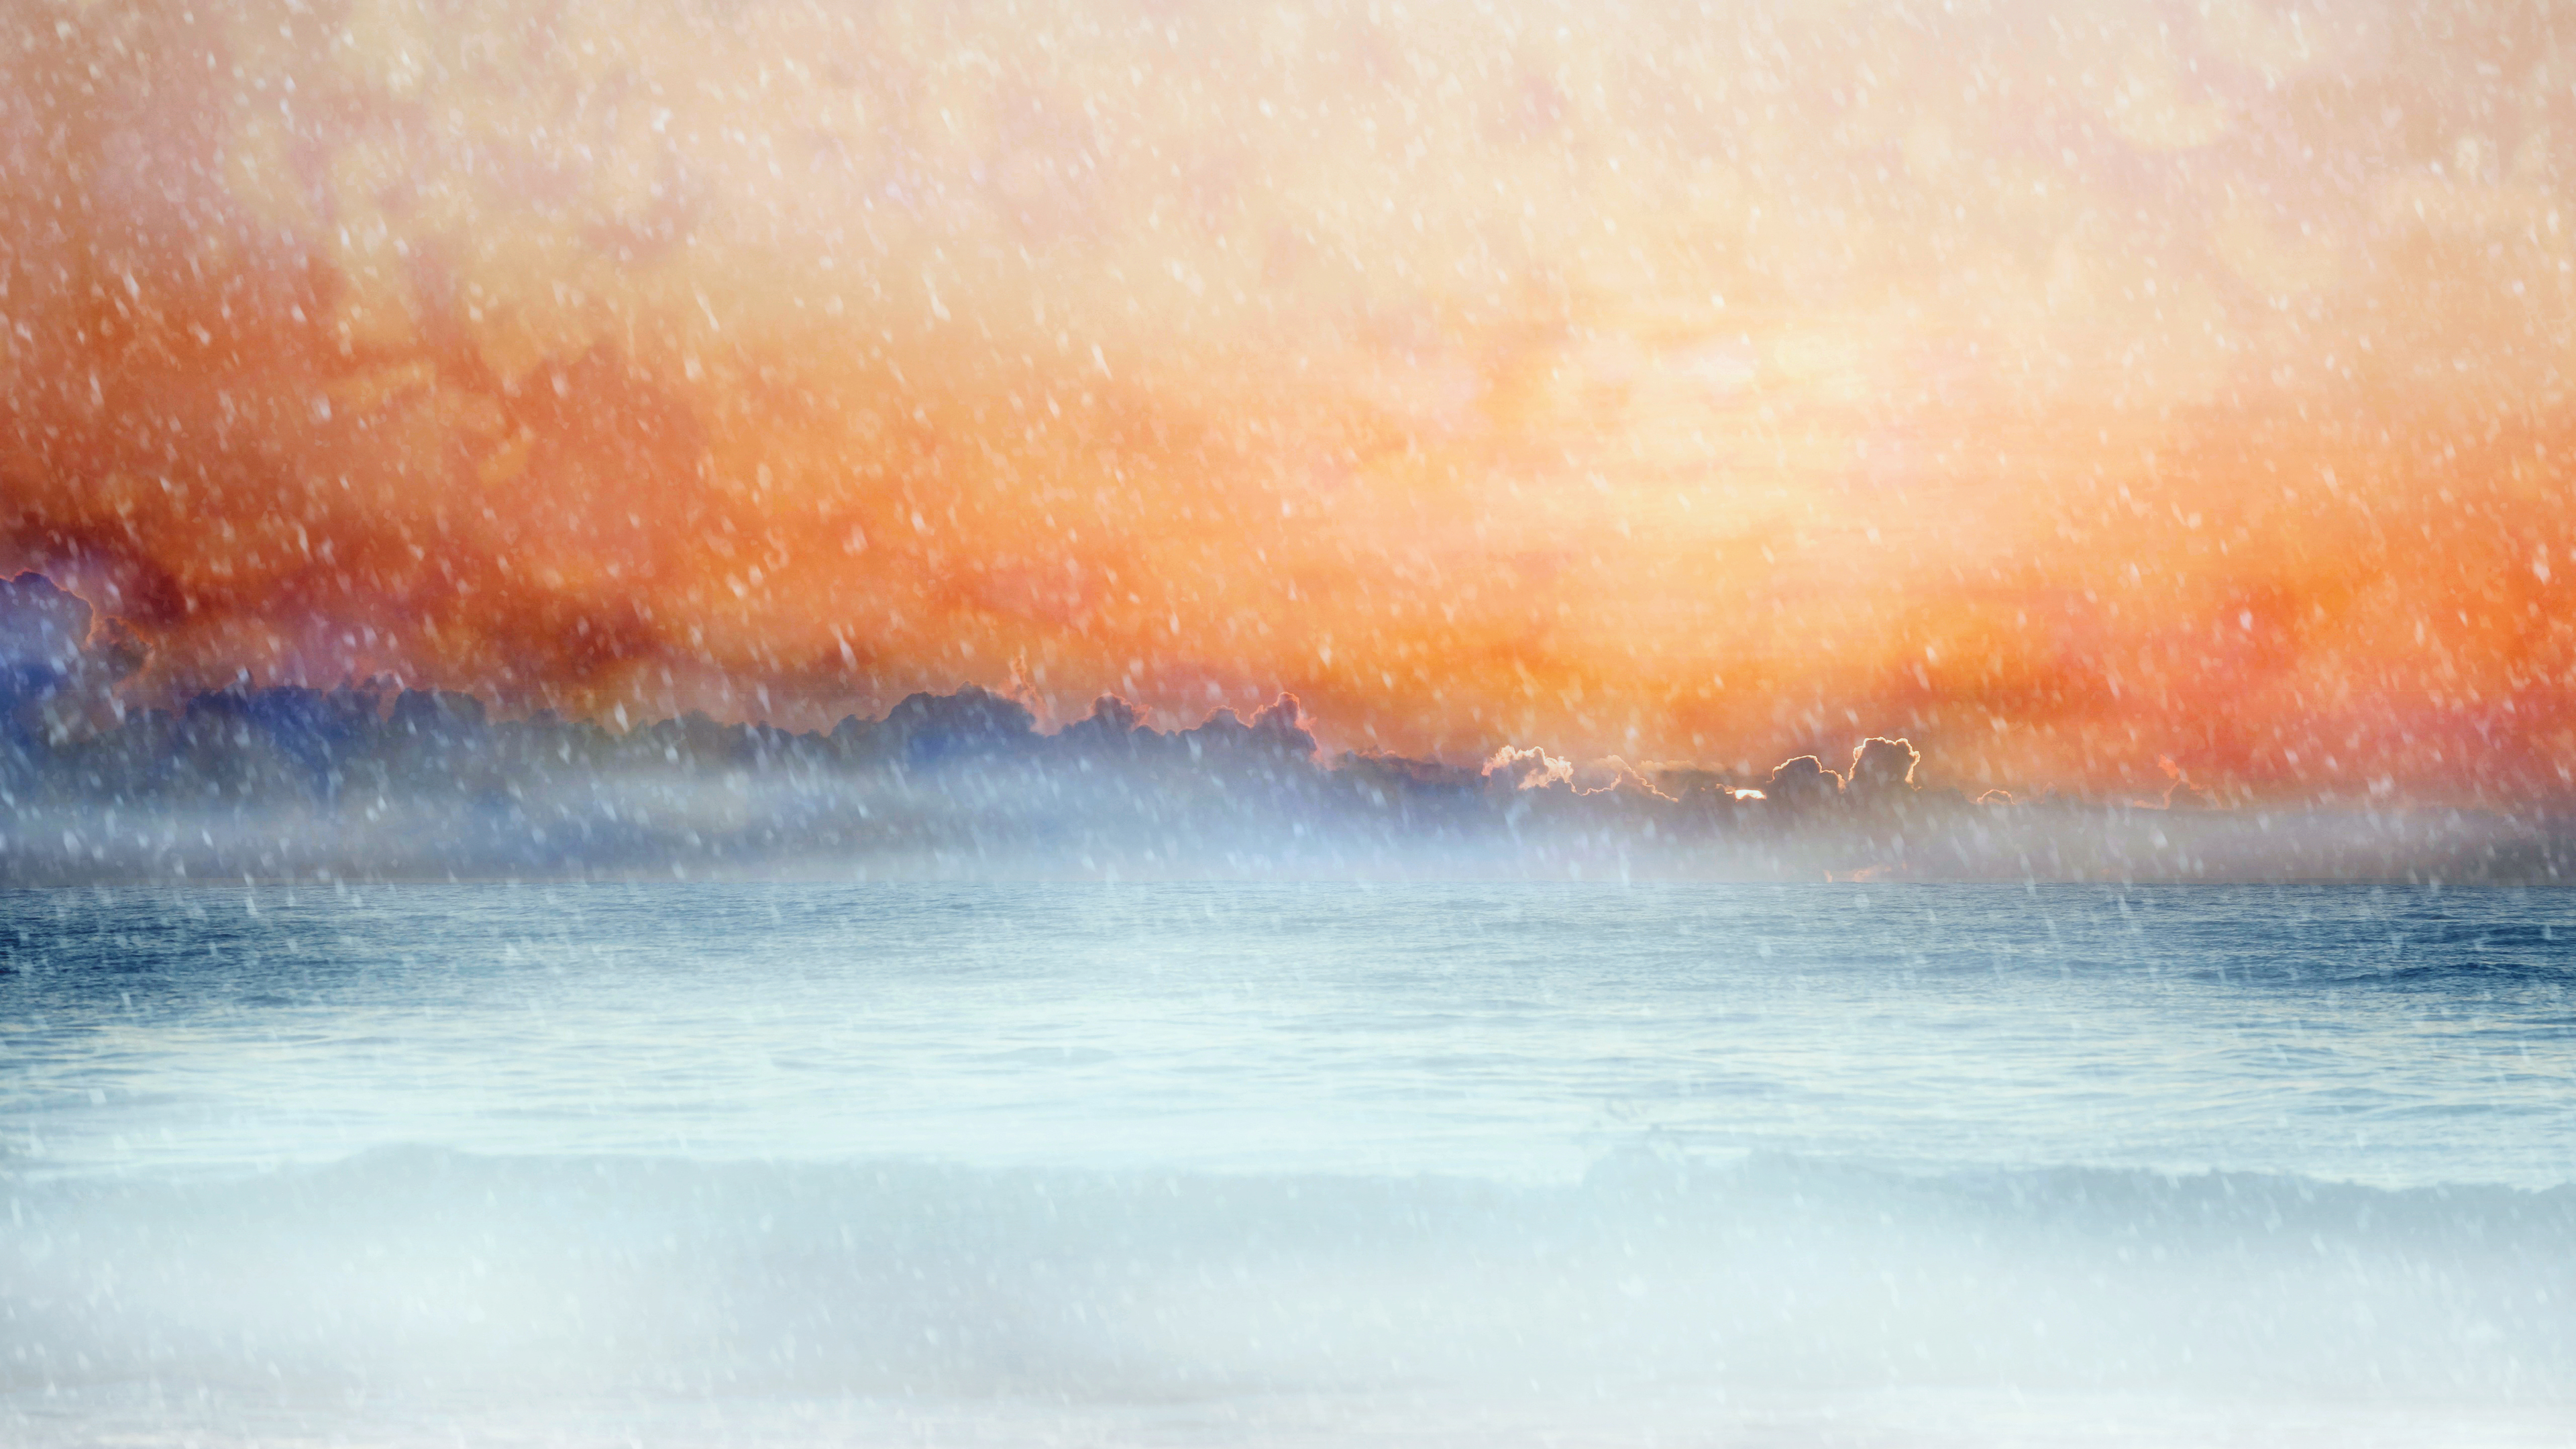 earth scenic clouds sea sky horizon 4k 1540136355 - Earth Scenic Clouds Sea Sky Horizon 4k - sky wallpapers, sea wallpapers, nature wallpapers, horizon wallpapers, hd-wallpapers, earth wallpapers, clouds wallpapers, 5k wallpapers, 4k-wallpapers